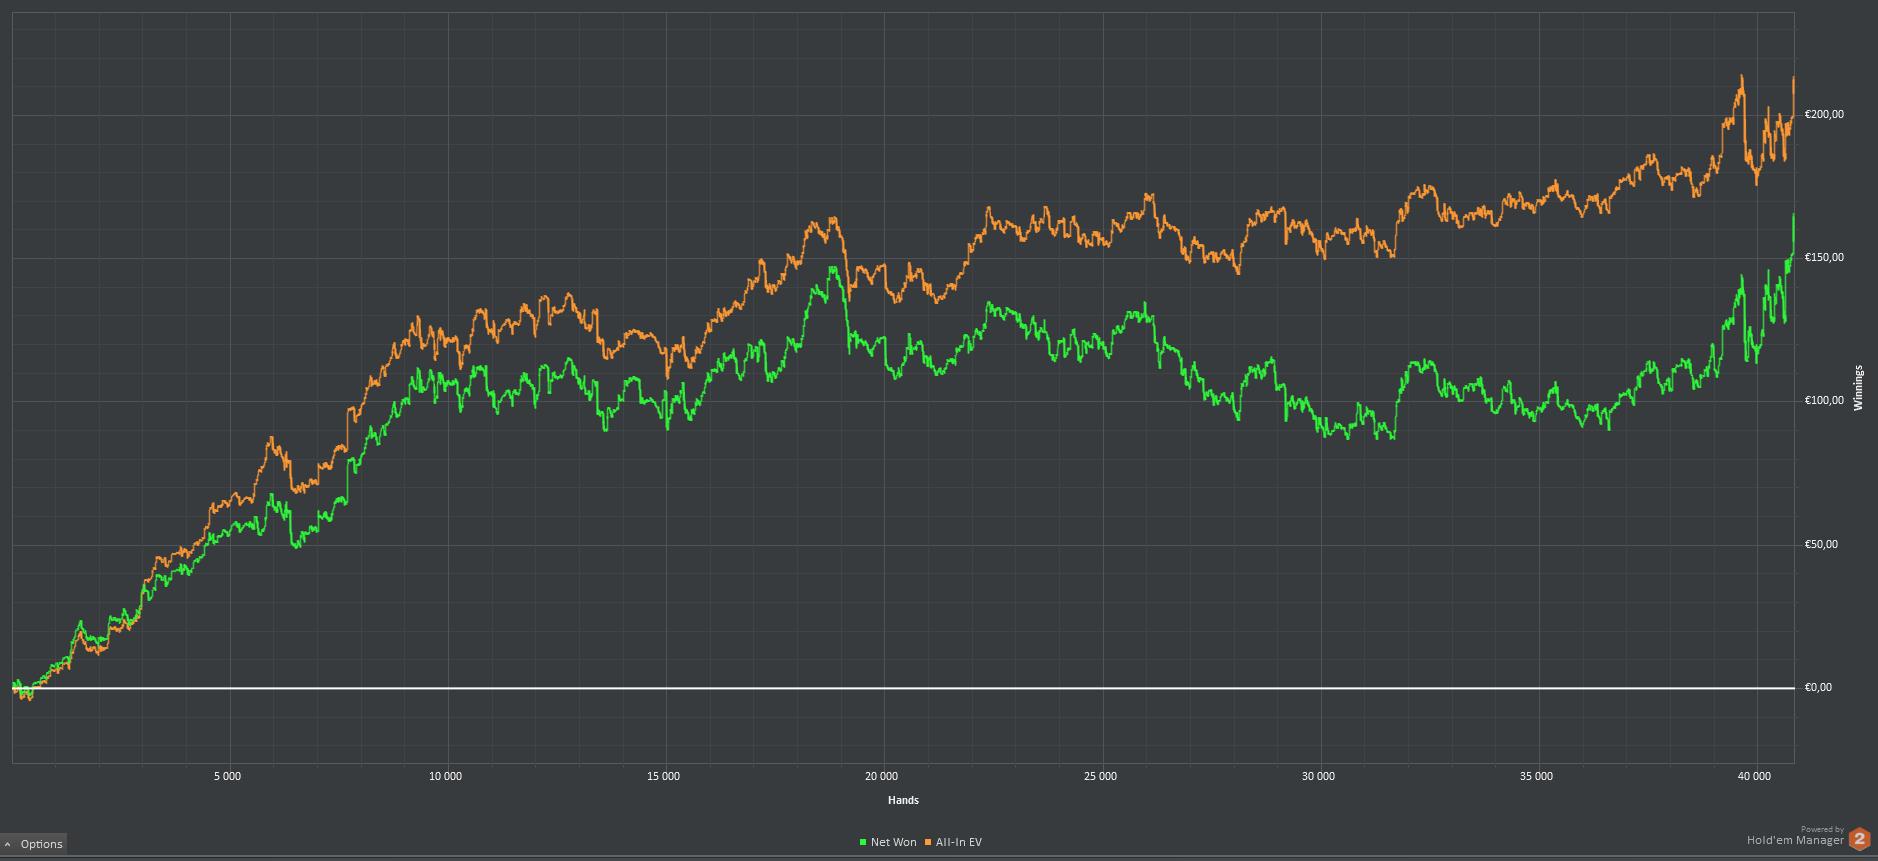 Graphe_2014-08-30.PNG